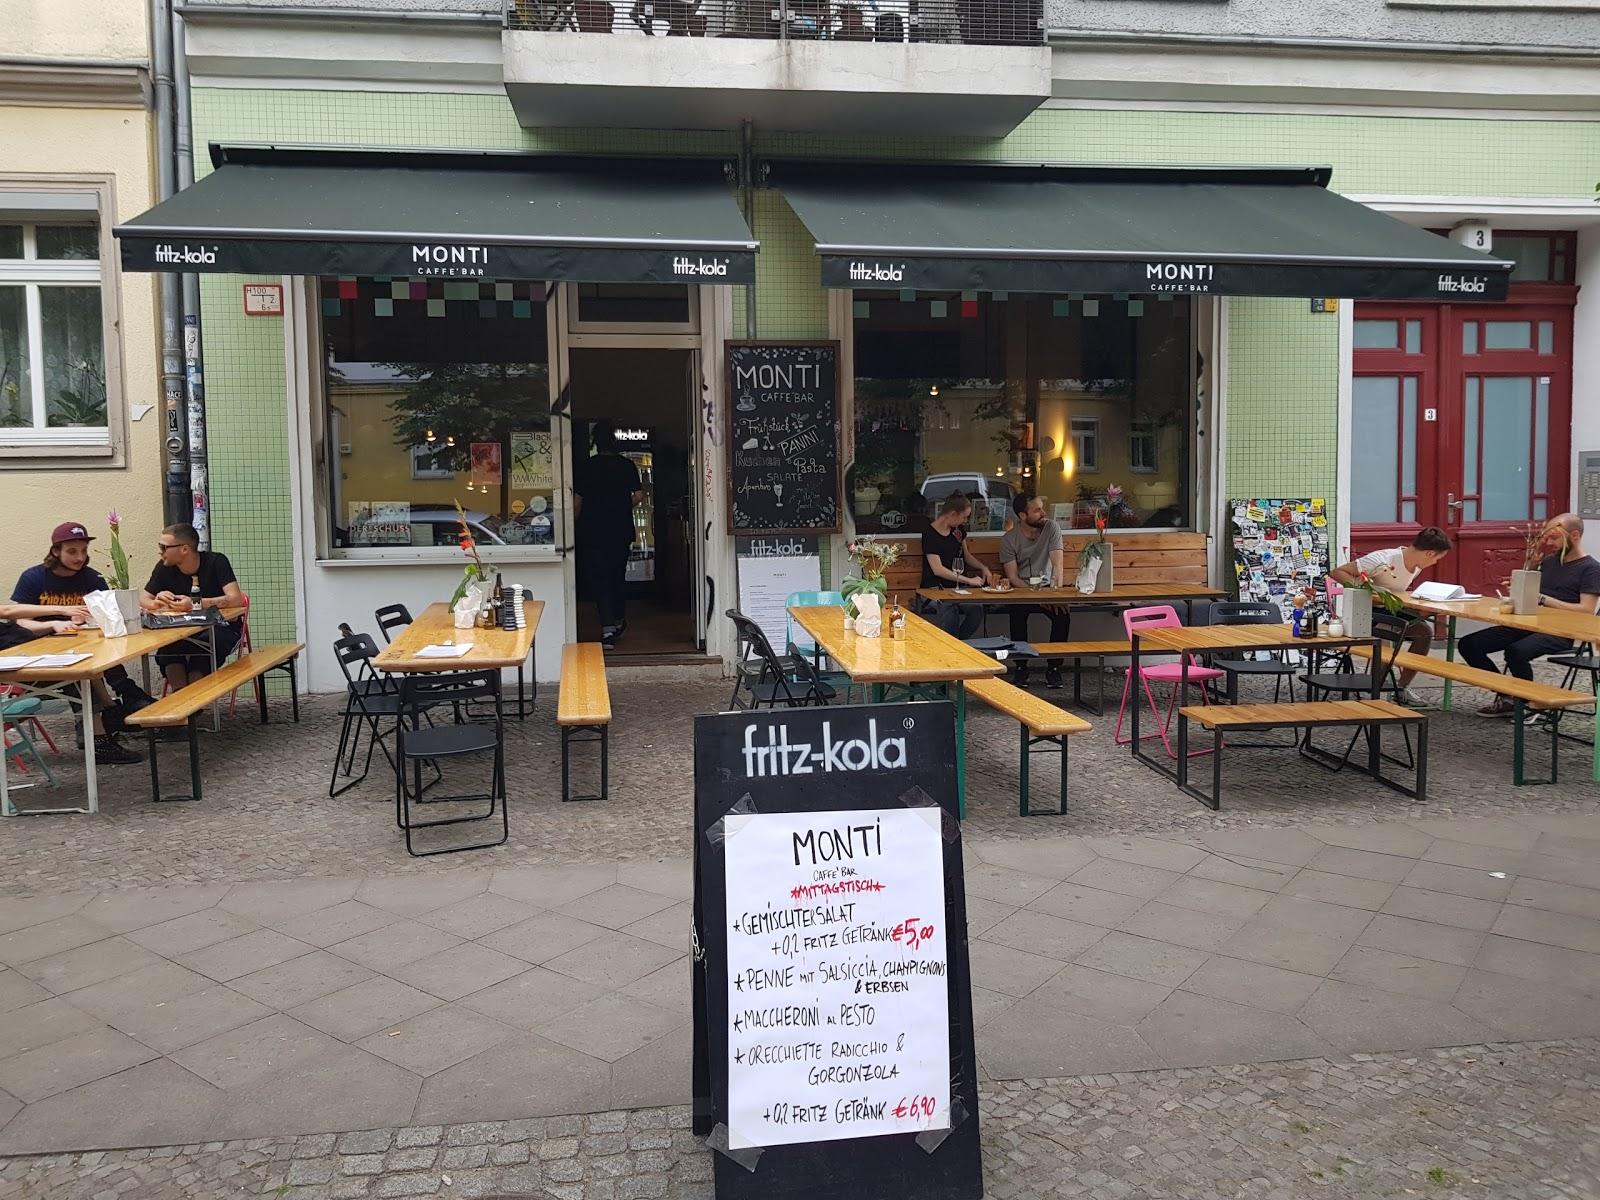 MONTI Caffe' BAR: A Work-Friendly Place in Berlin